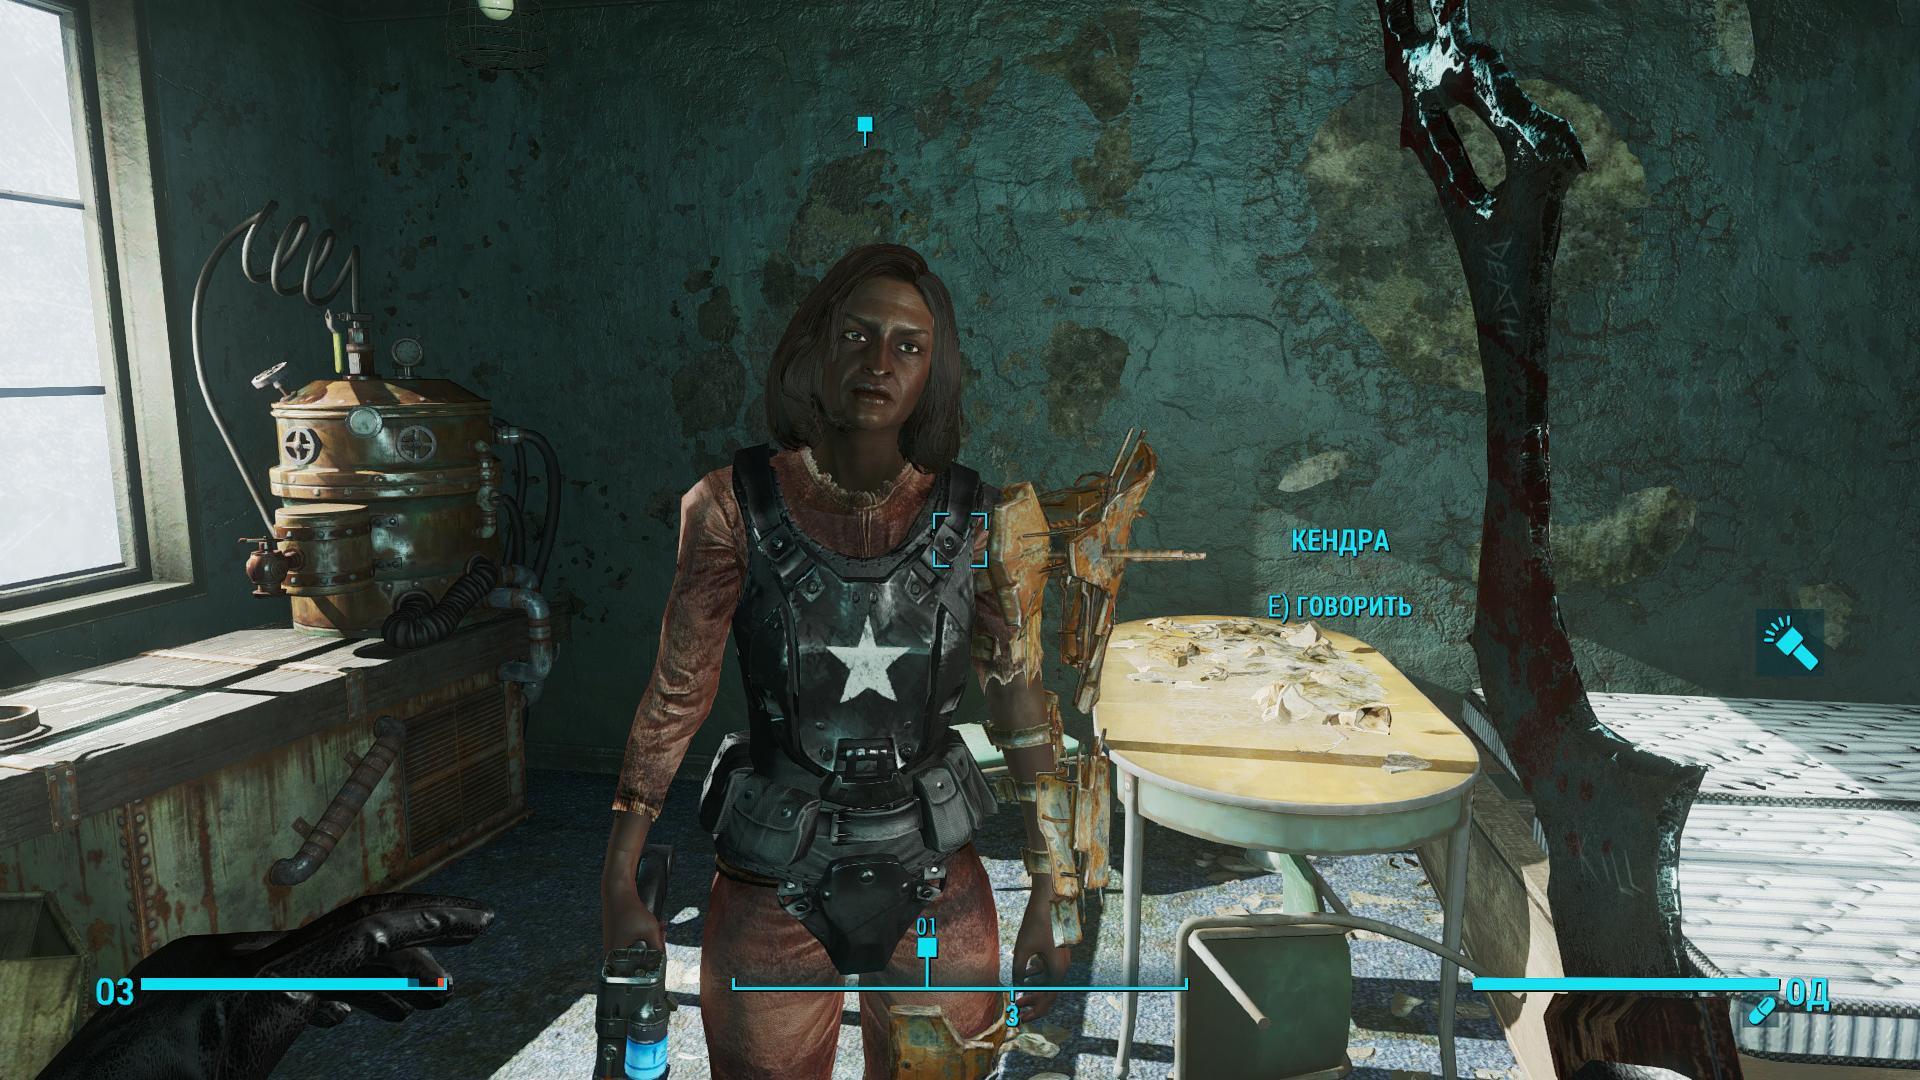 000525.Jpg - Fallout 4